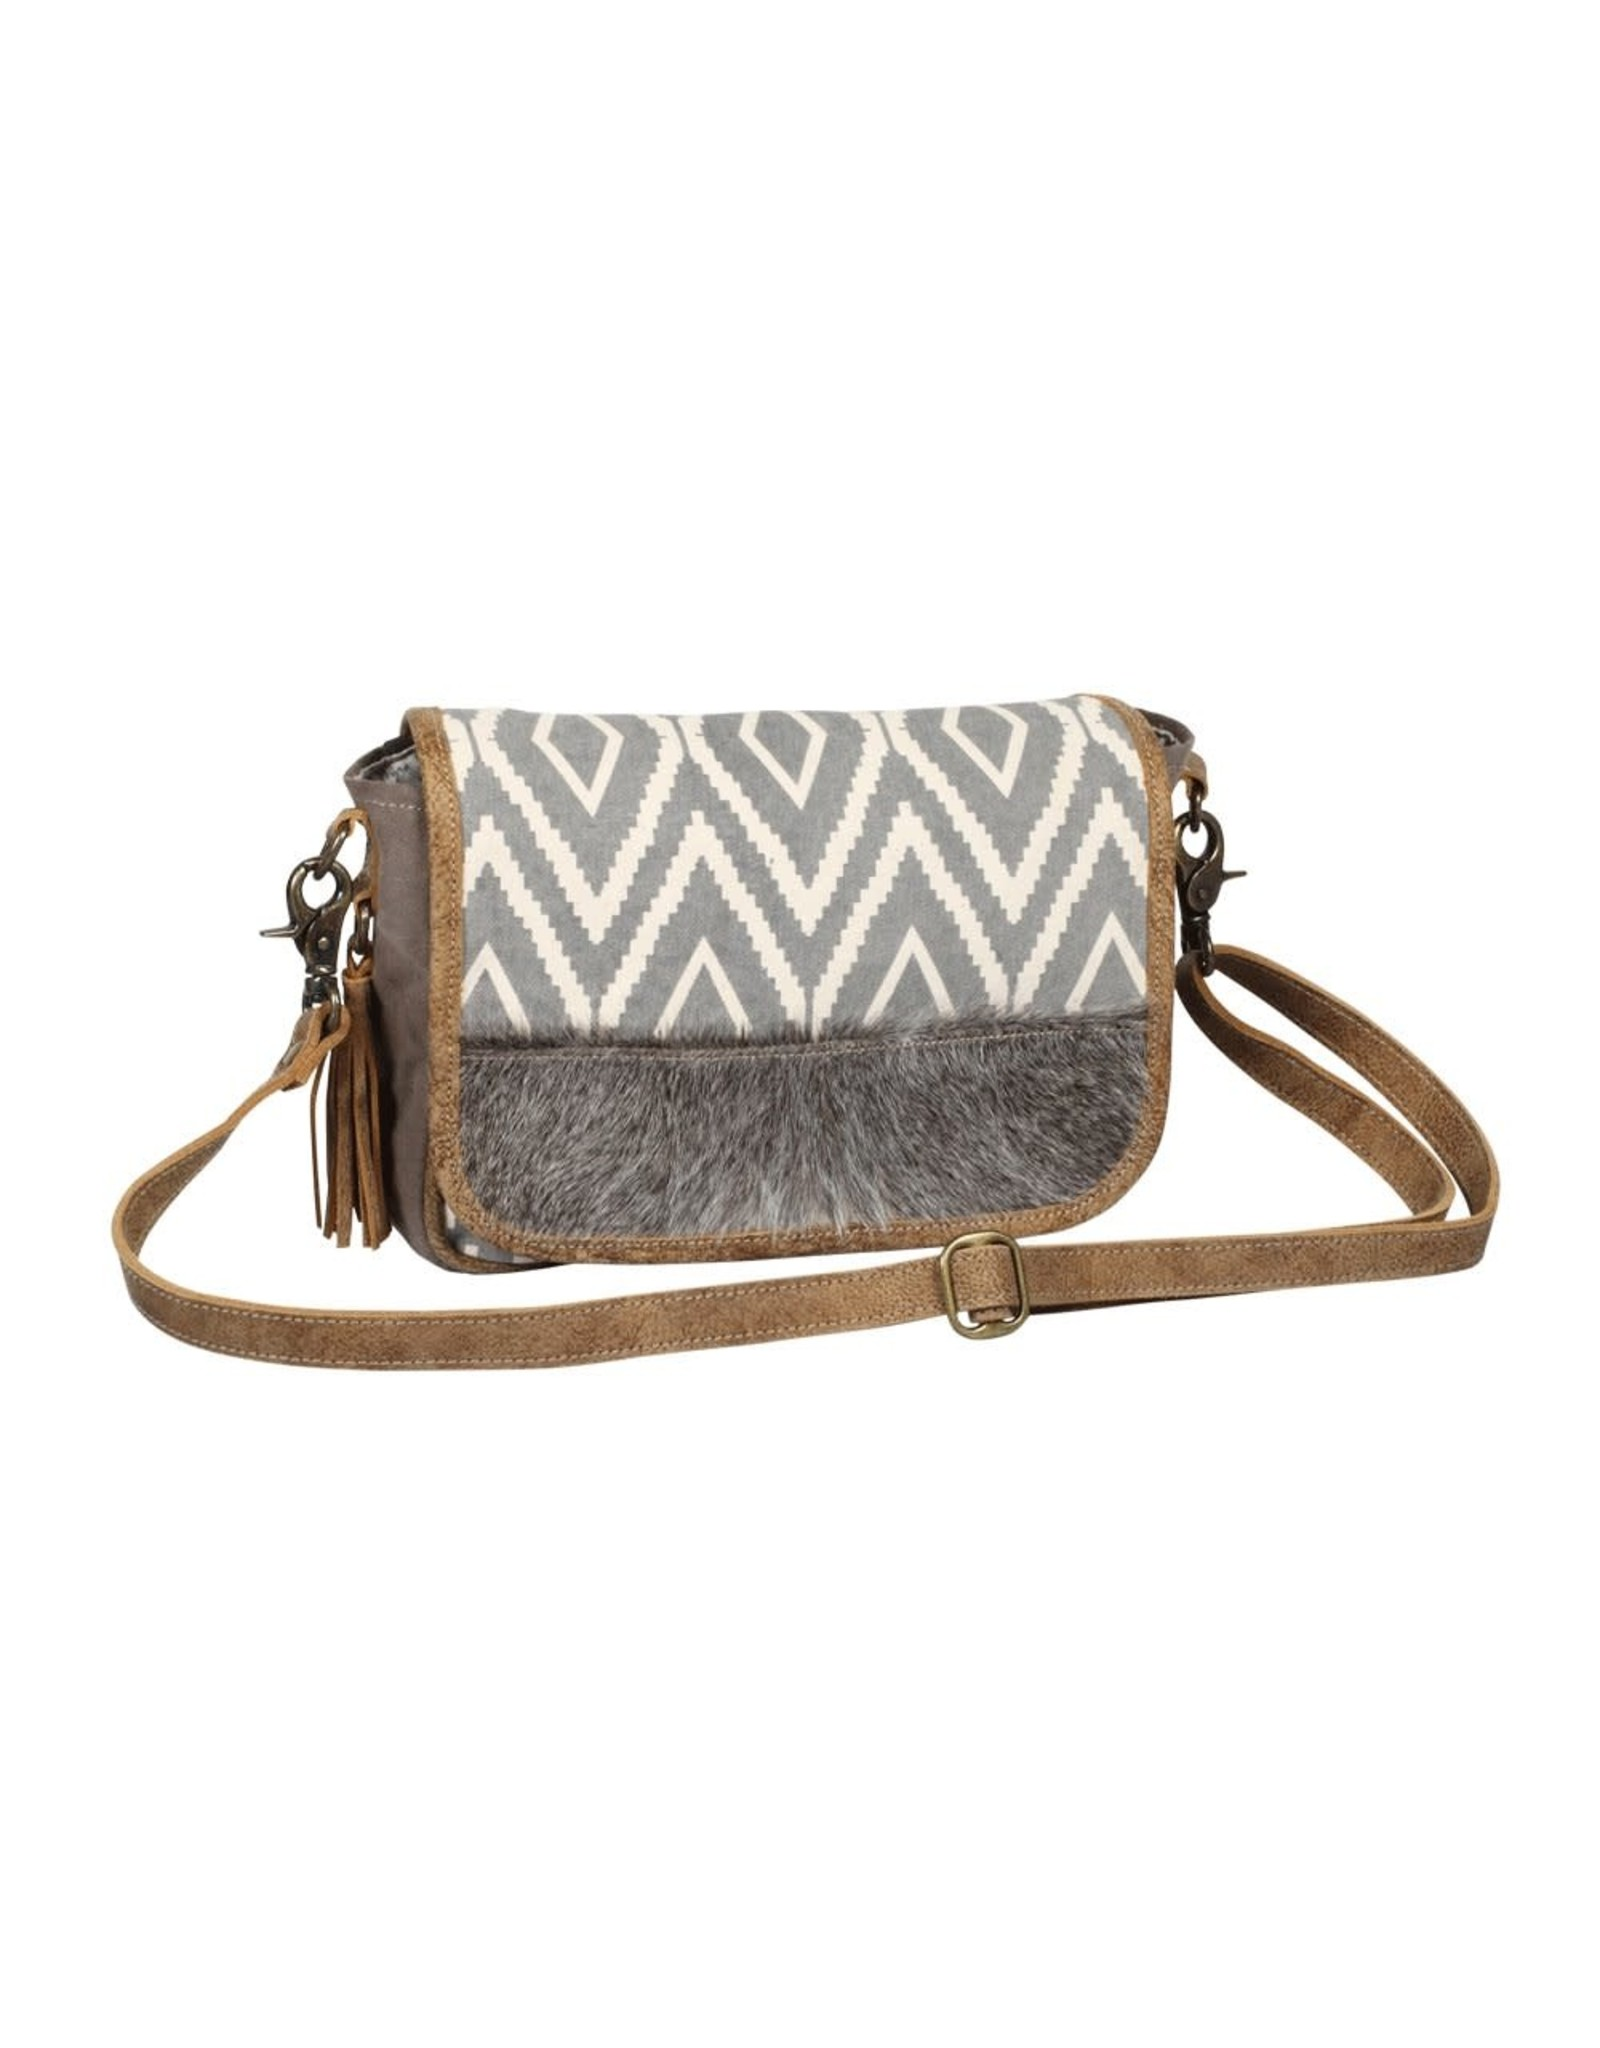 Myra Bags S-1348 Utilitarian Small & Crossbody Bag